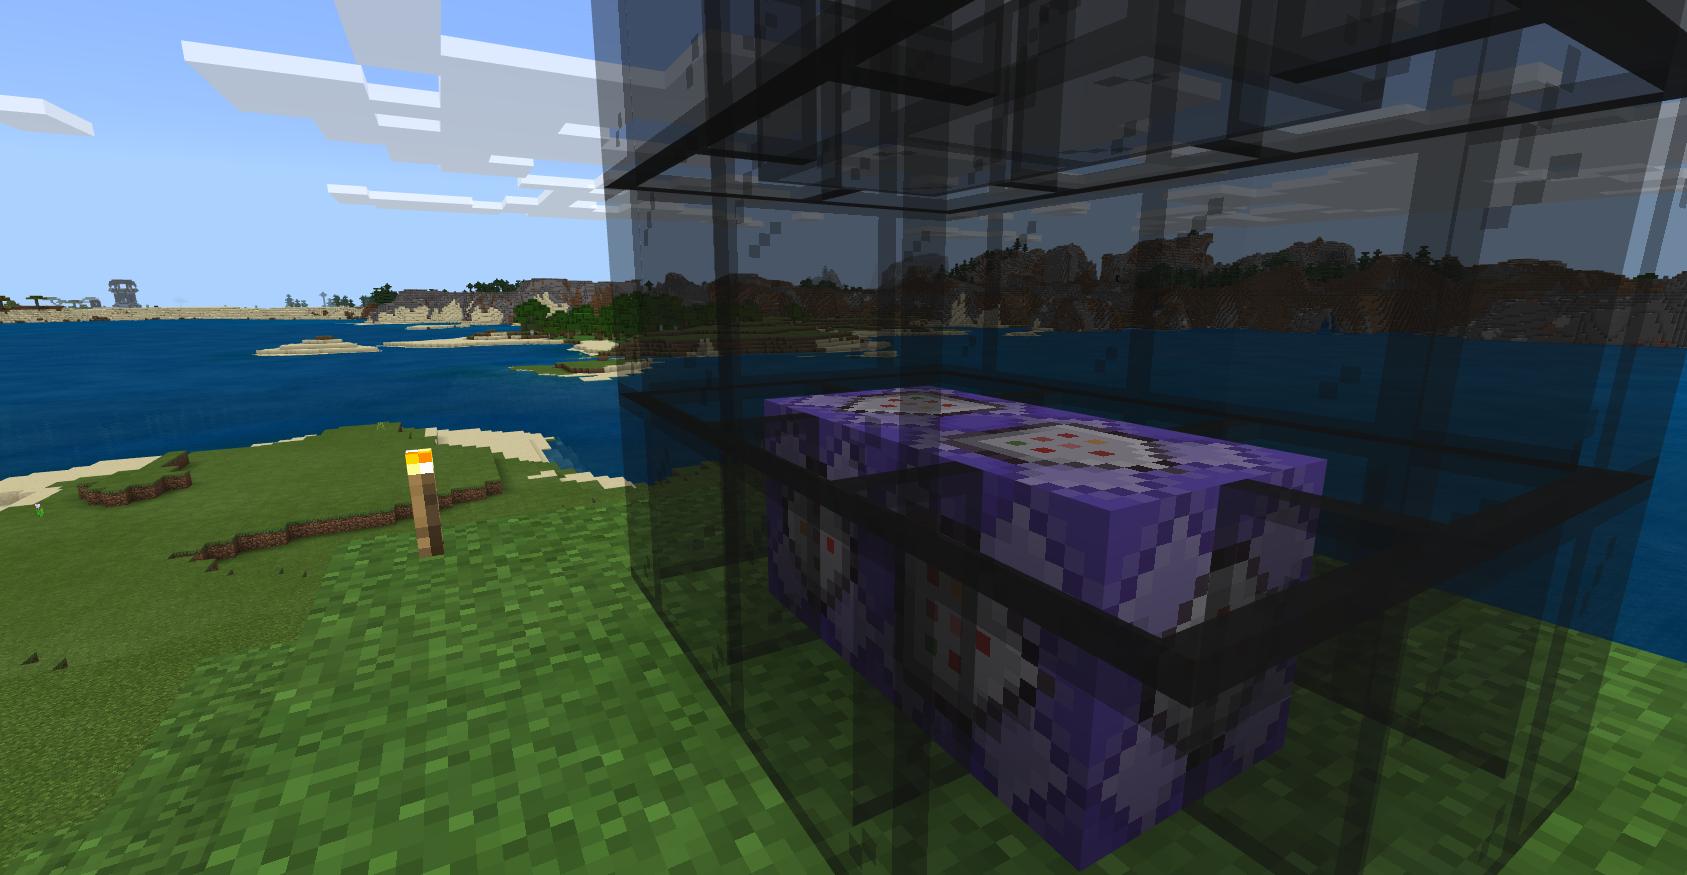 Some purple Command Blocks behind black glass panes